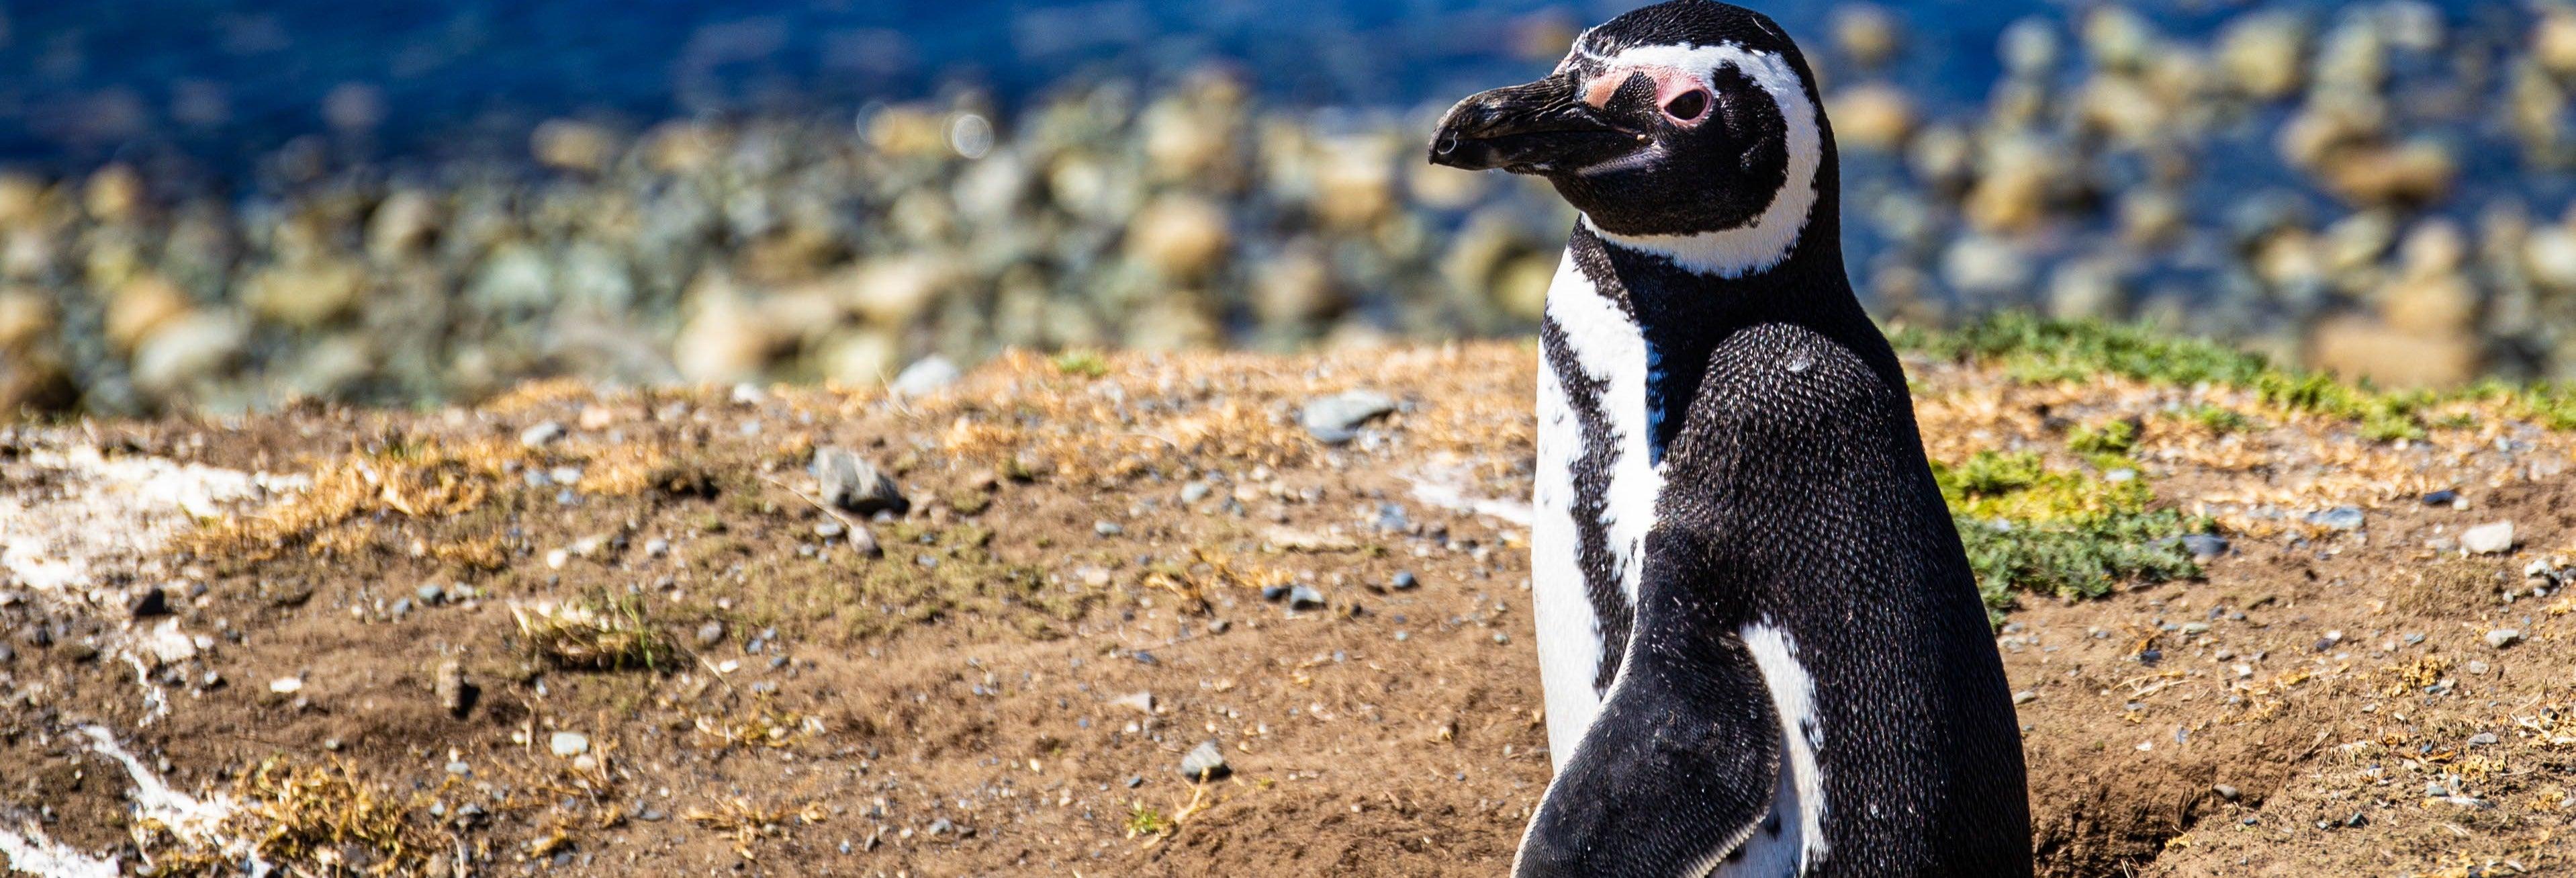 Avistamiento de pingüinos en la isla Cachagua